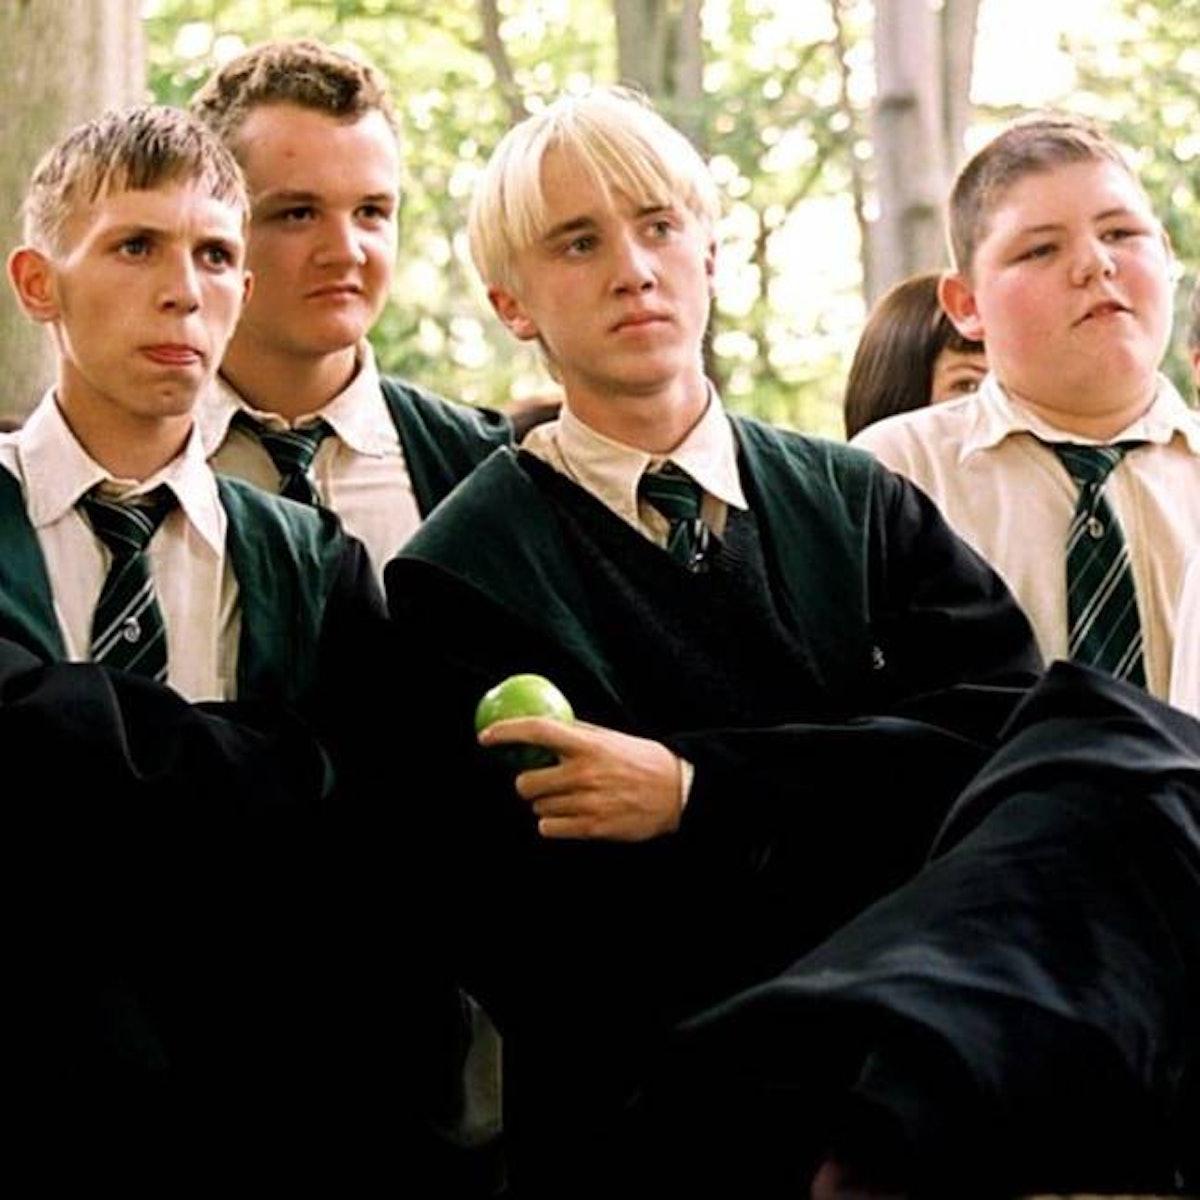 Tom Felton in 'Harry Potter'